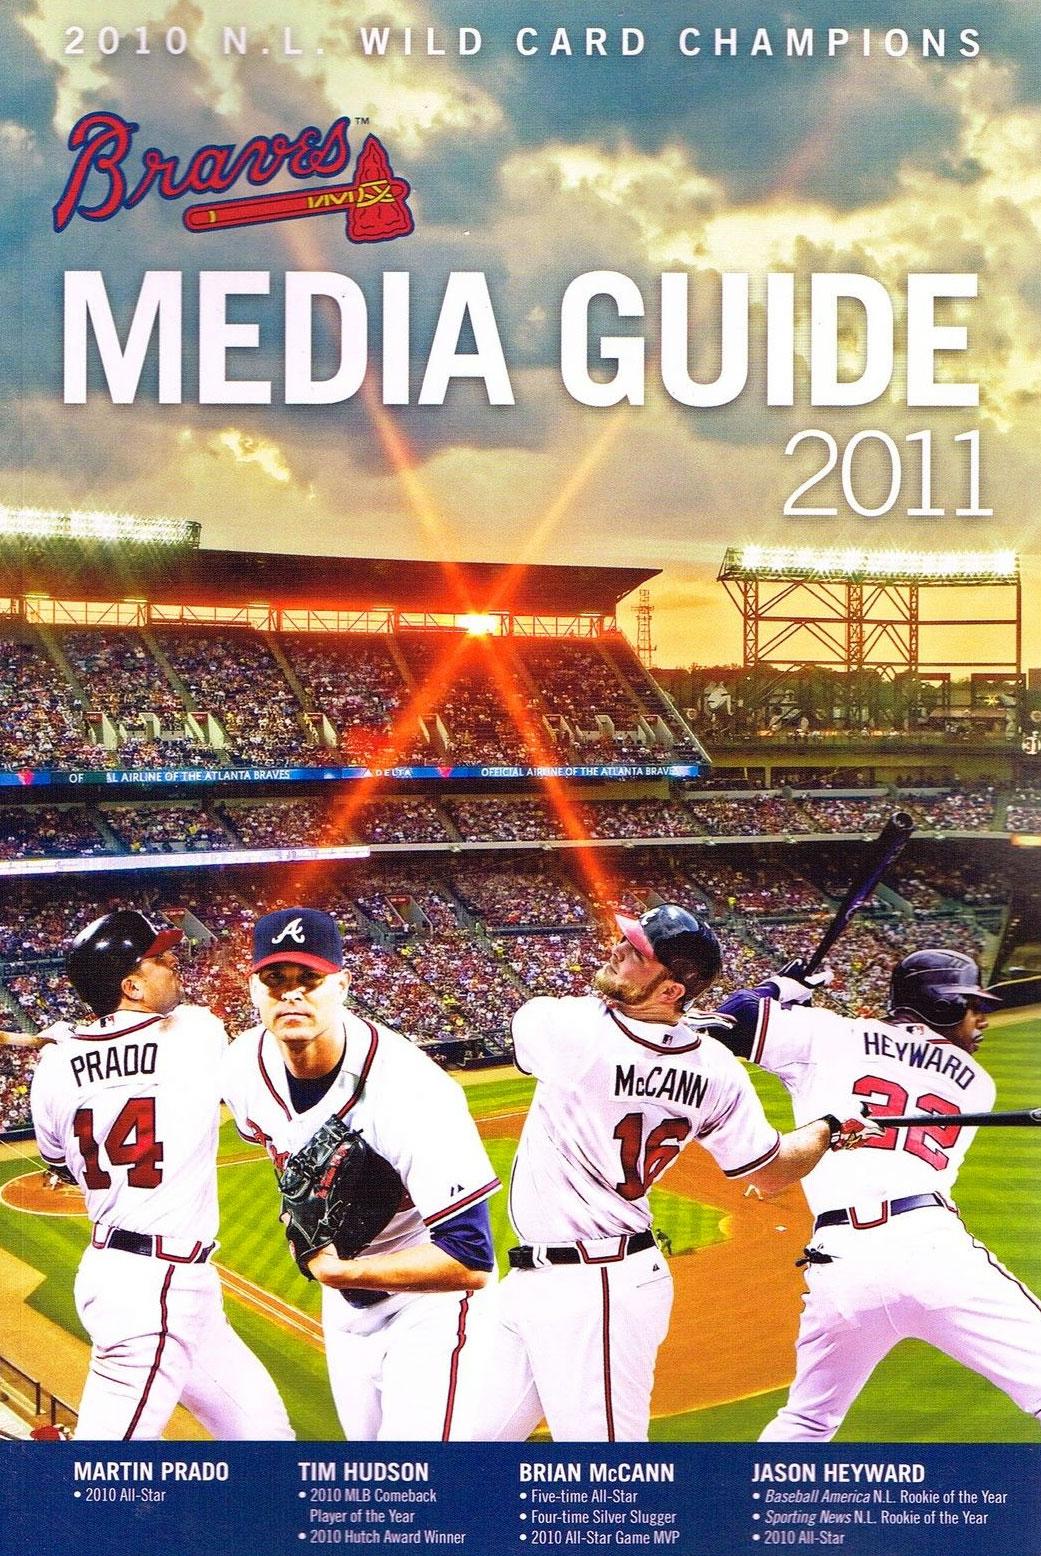 Atlanta Braves Media Guide Media Guide (2011) -  SportsLogos.Net